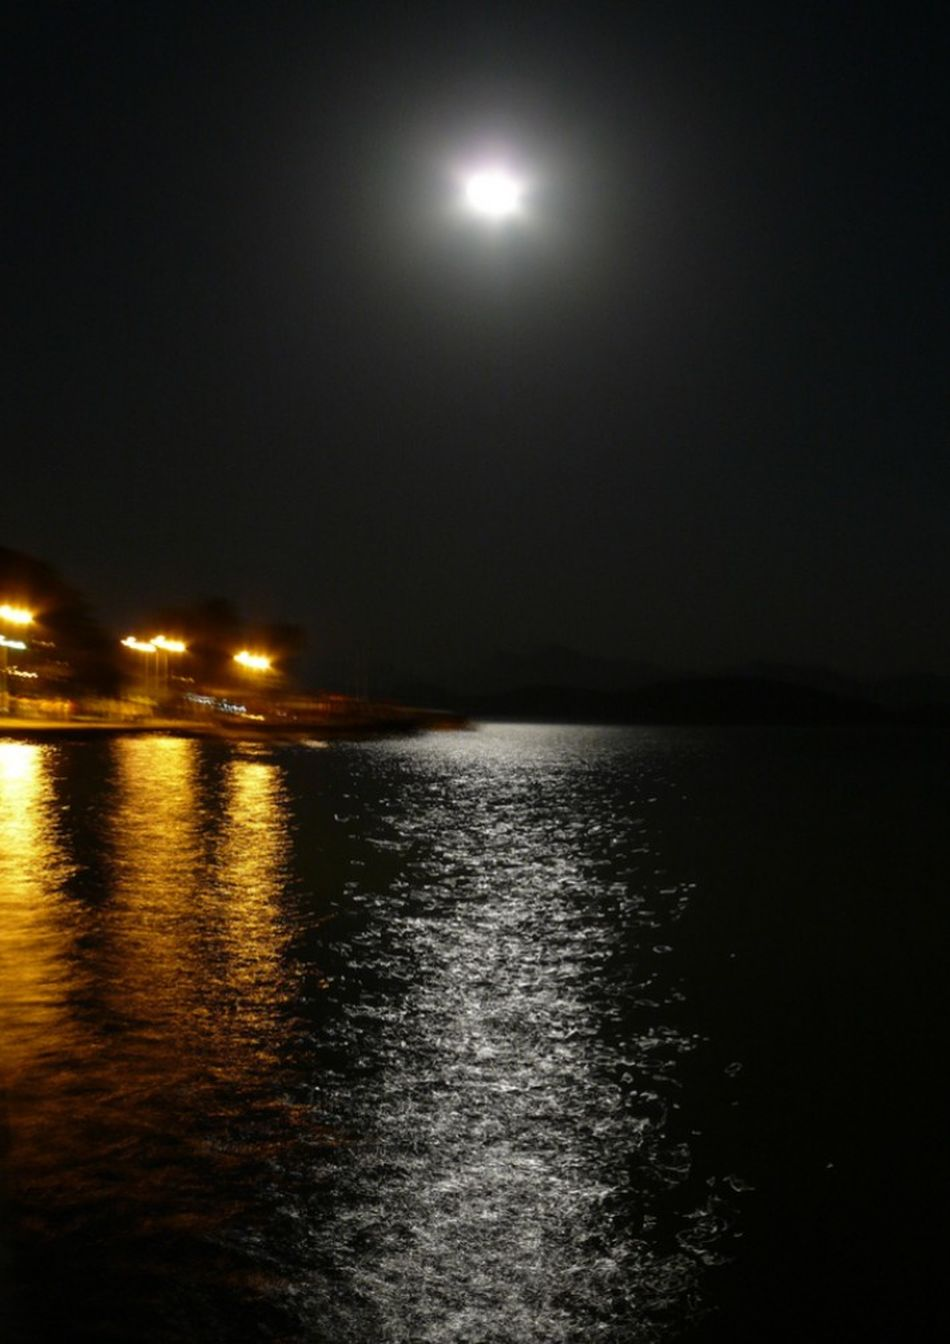 Yakamoz Moonlight Moon Moonphotography Relaxing Relax Time  Phosphorescence Love HelloEyeEm No People Nofilter EyeEmNewHere Relax Time  No People Beauty In Nature Bestshot EyeemTeam Nature Köyceğiz Köyceğiz Gölü Welcome To Black